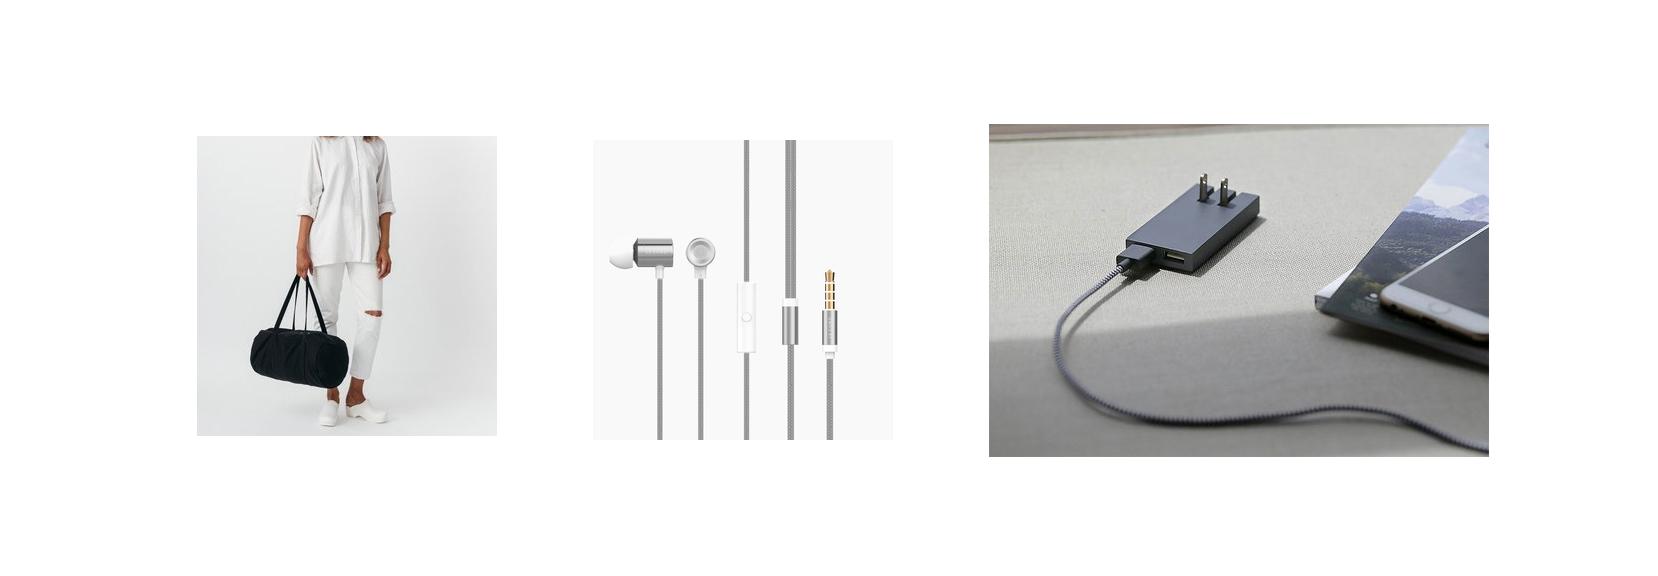 Baggu Canvas Duffel, Silver Le Cord Headphones, Smart Native Union Charger